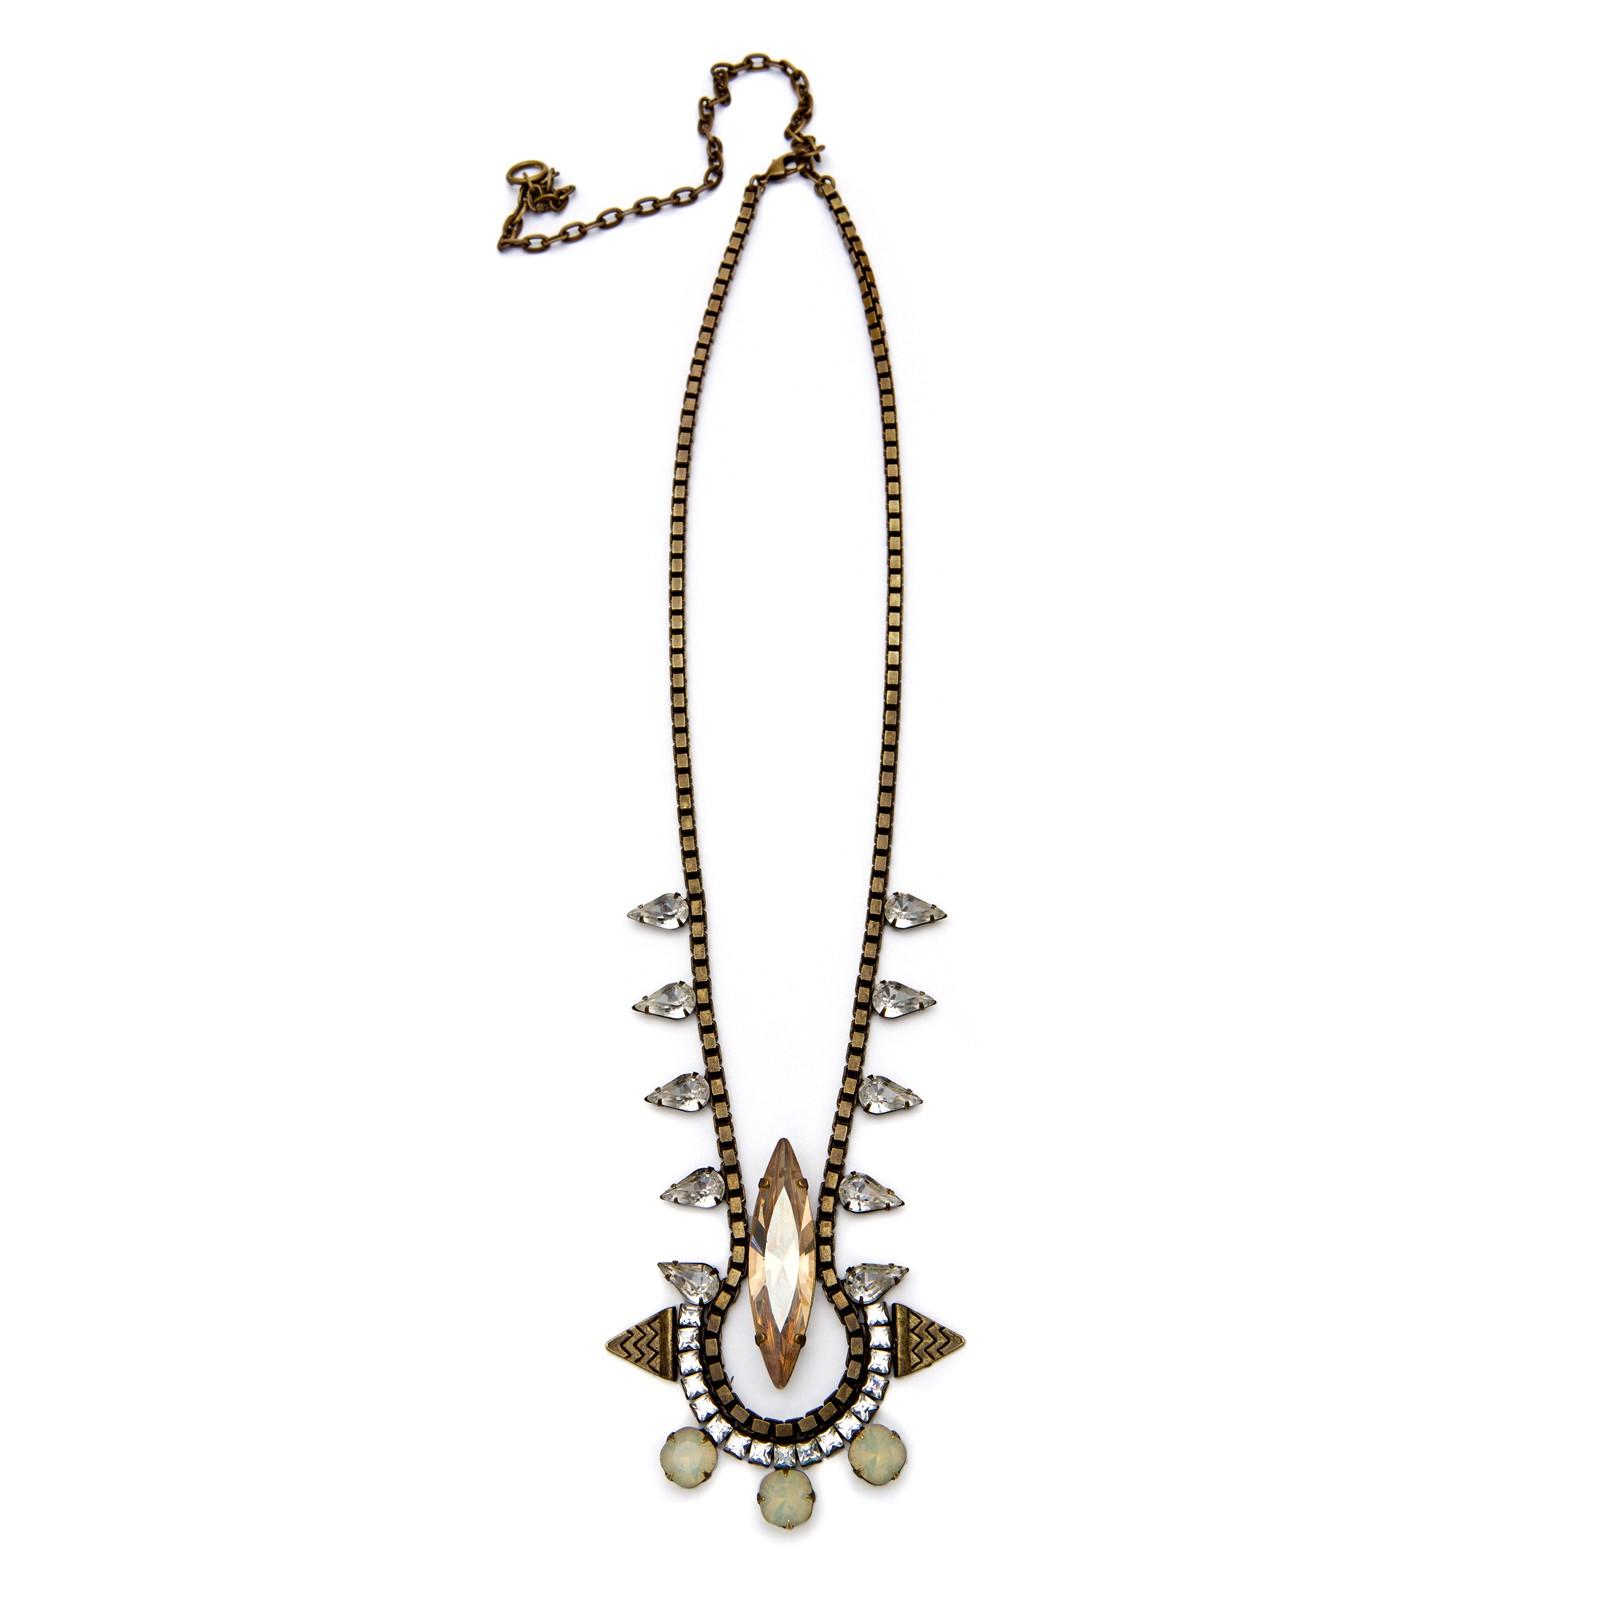 gizele lionette - madeofjewelry